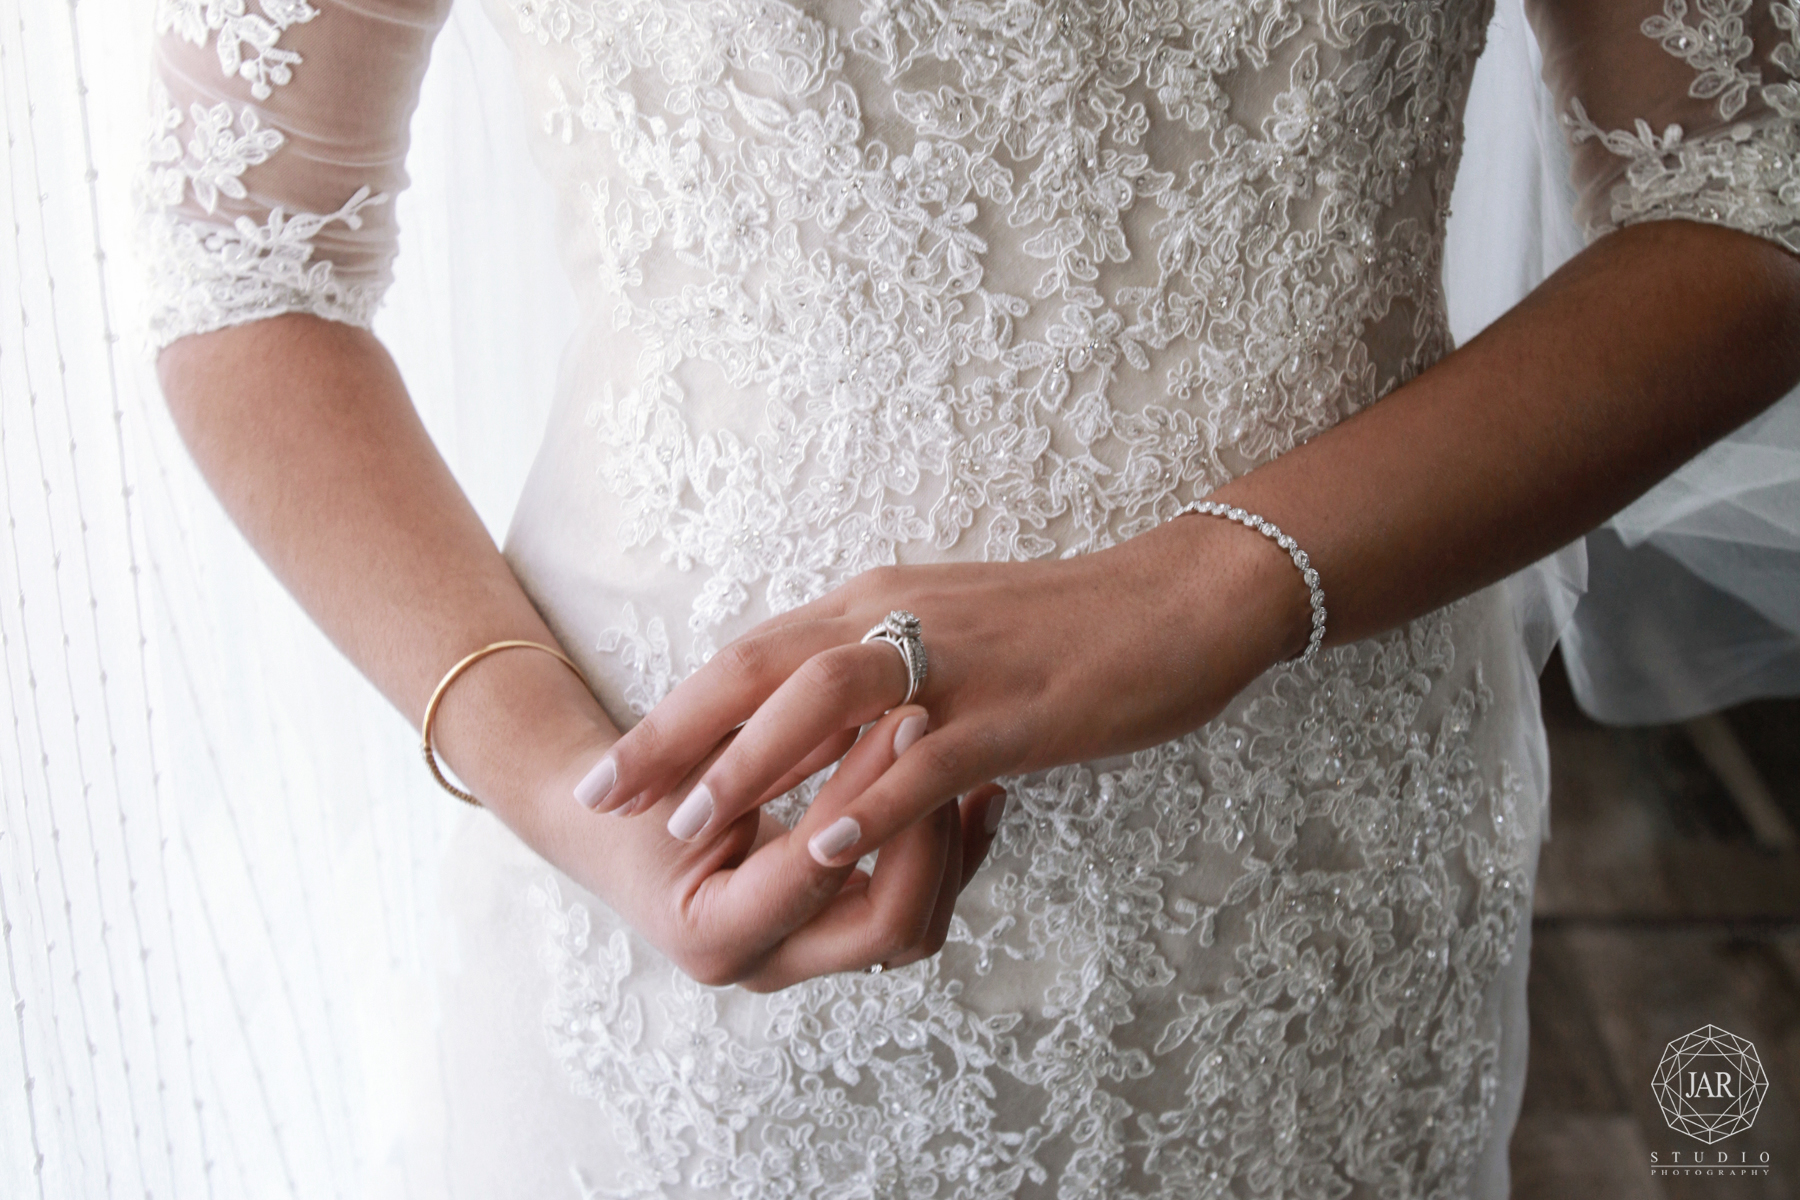 05-beautiful-engagement-ring-2017-wedding-trends-orlando-photographer.jpg